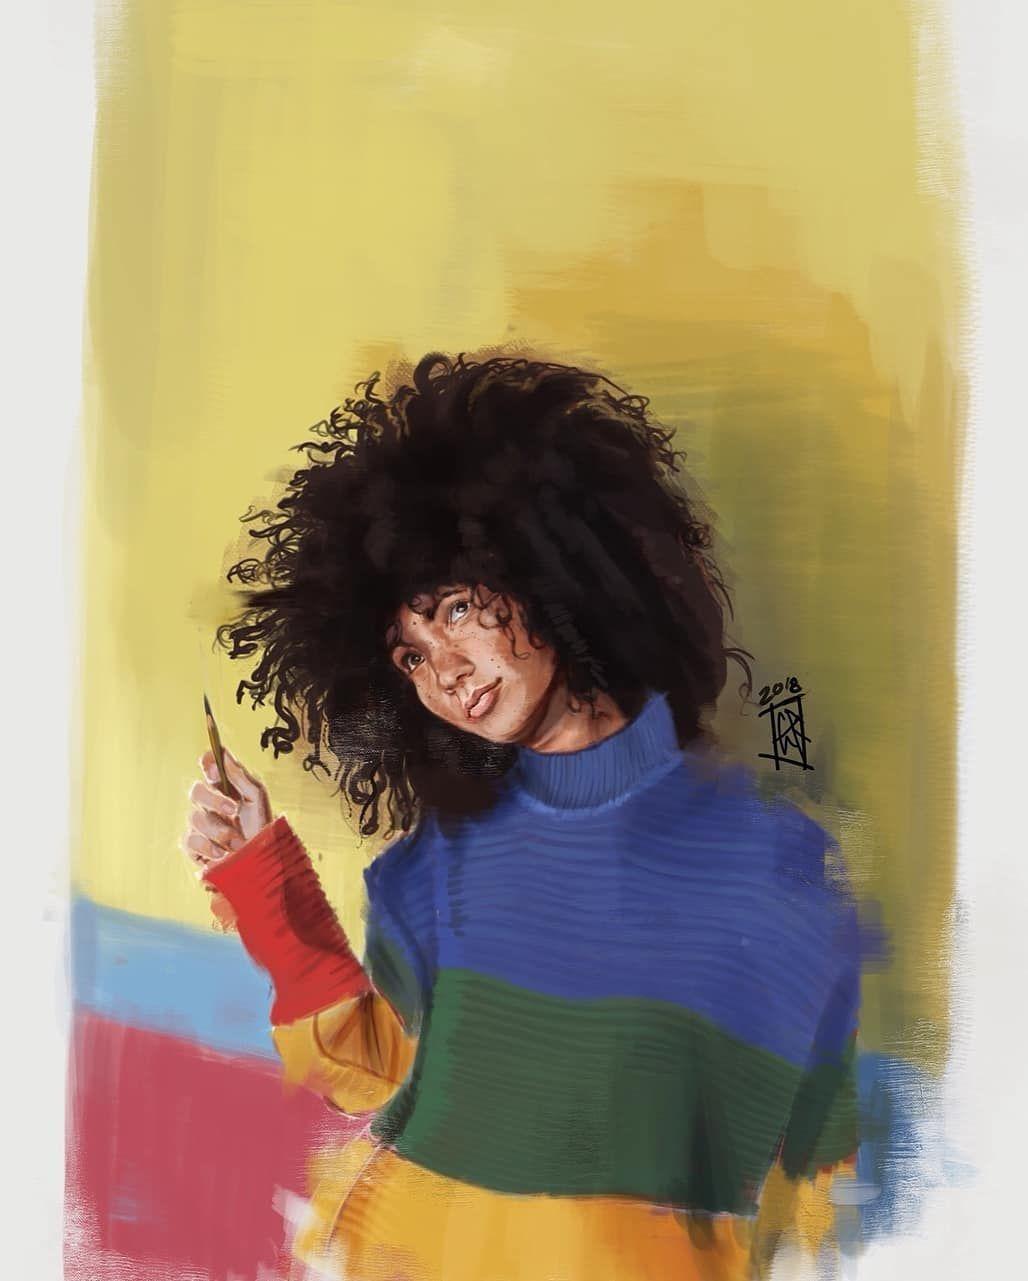 #DopeBlackArt by @roweart . . #dopeblackartist #dopeblackartists #dopeblackartart #blackgirlmagic #blackgirls #dopeblackartwork #melaninqueen #blackartsupport #dopeblackart #blackgirlsrock #melaninpoppin #artist #nailart #blackart #blackgirlswhoblog #blackartist #prilaga #dopeblackartgottaluvit👑 #instaart #melanin #art #blackartmatters #melaninmagic #artwork #blackartists #blackgirl #melaninonfleek